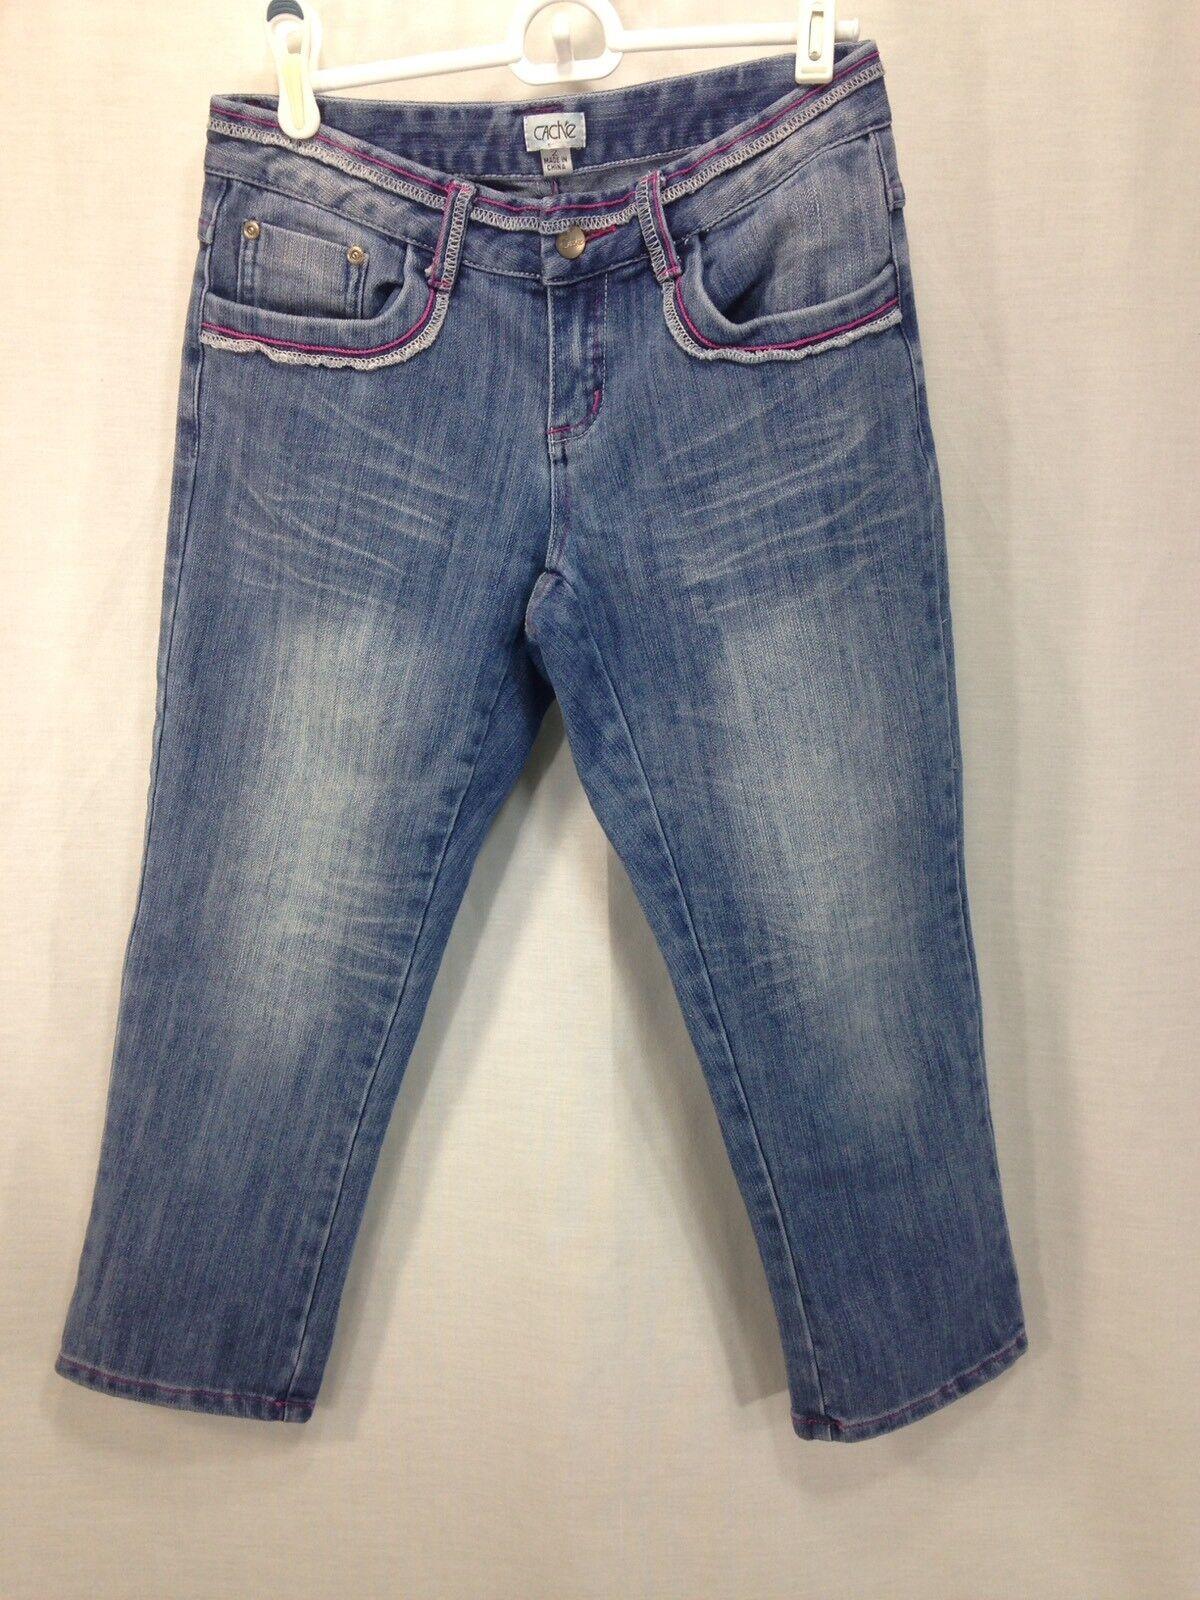 Cache Capri Jeans Womens Size 2 bluee Stretch Denim Cotton Blend Cropped Pants